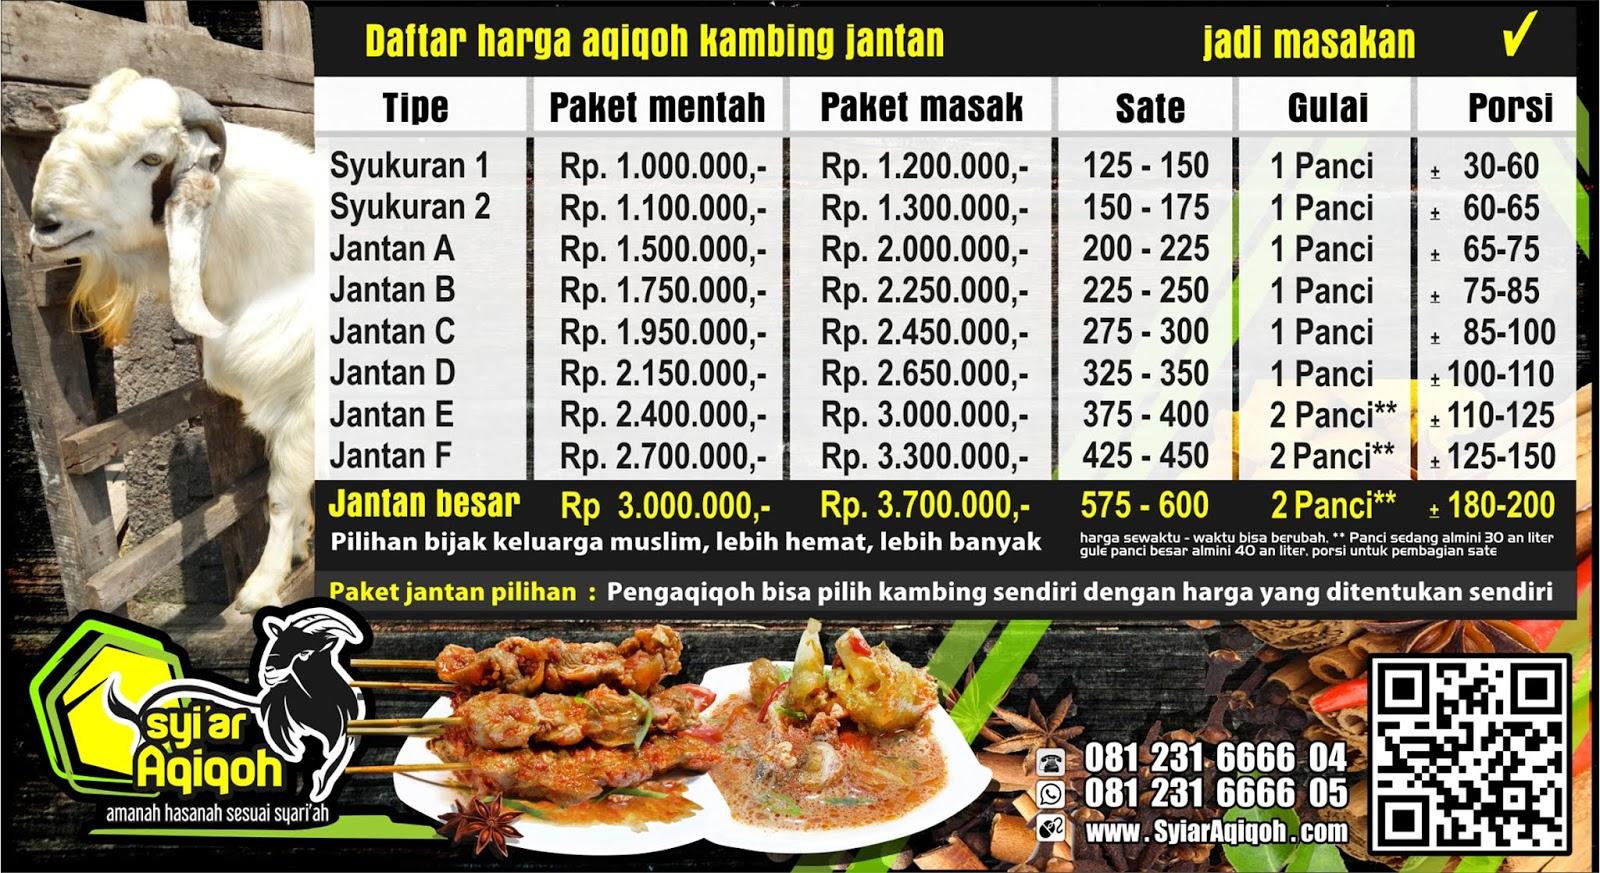 Harga Paket Aqiqah Surabaya 2019 | 081231666604